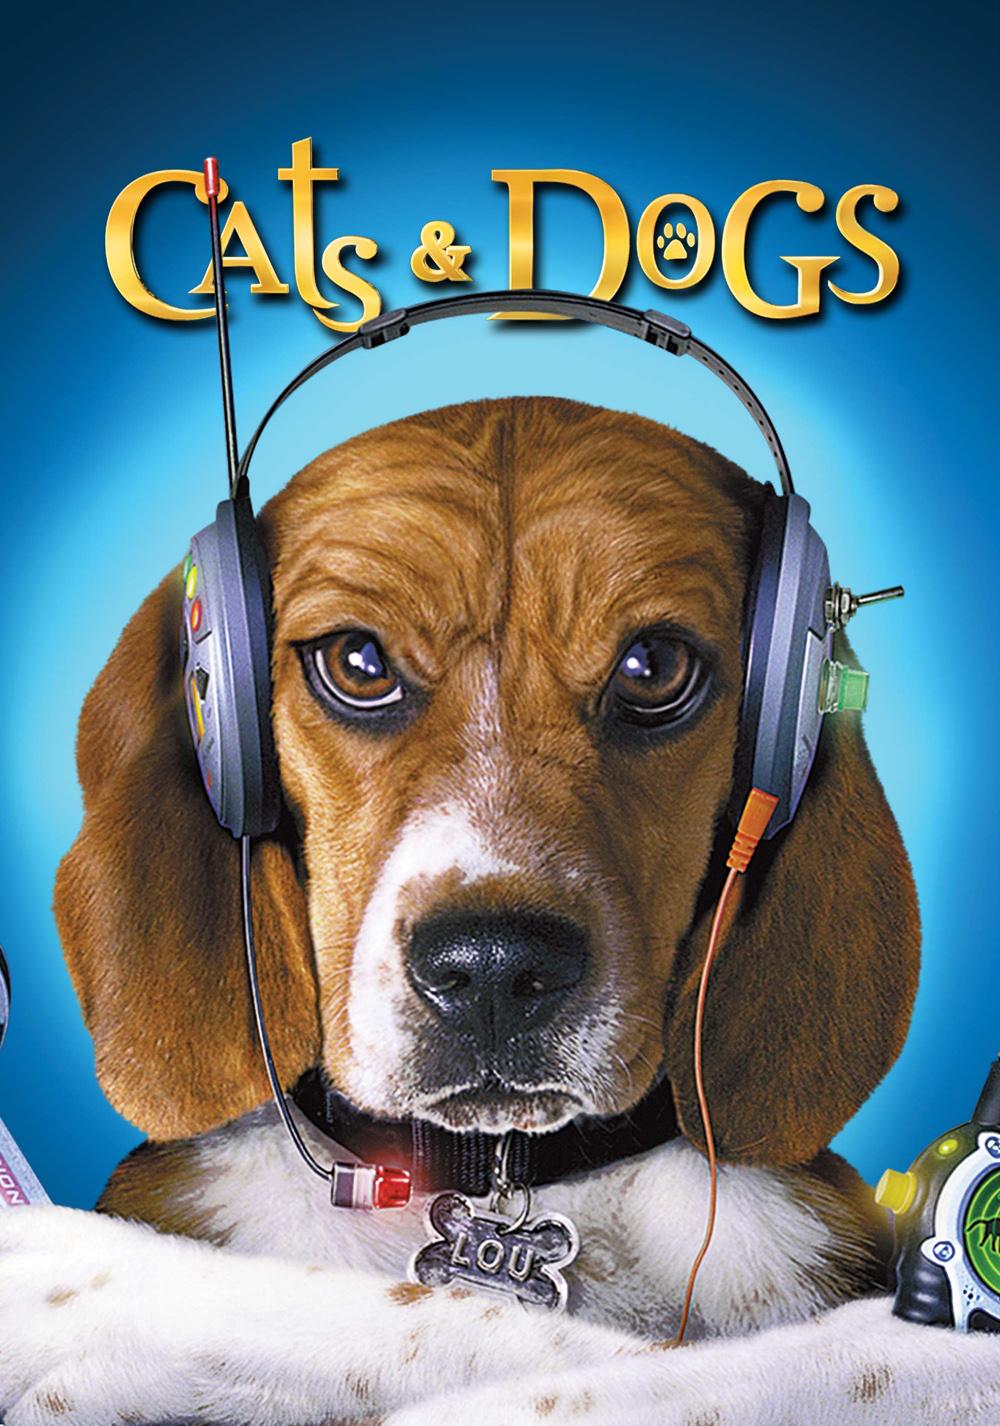 Cats & Dogs [2001] [DVDR] [NTSC] [Subtitulado]